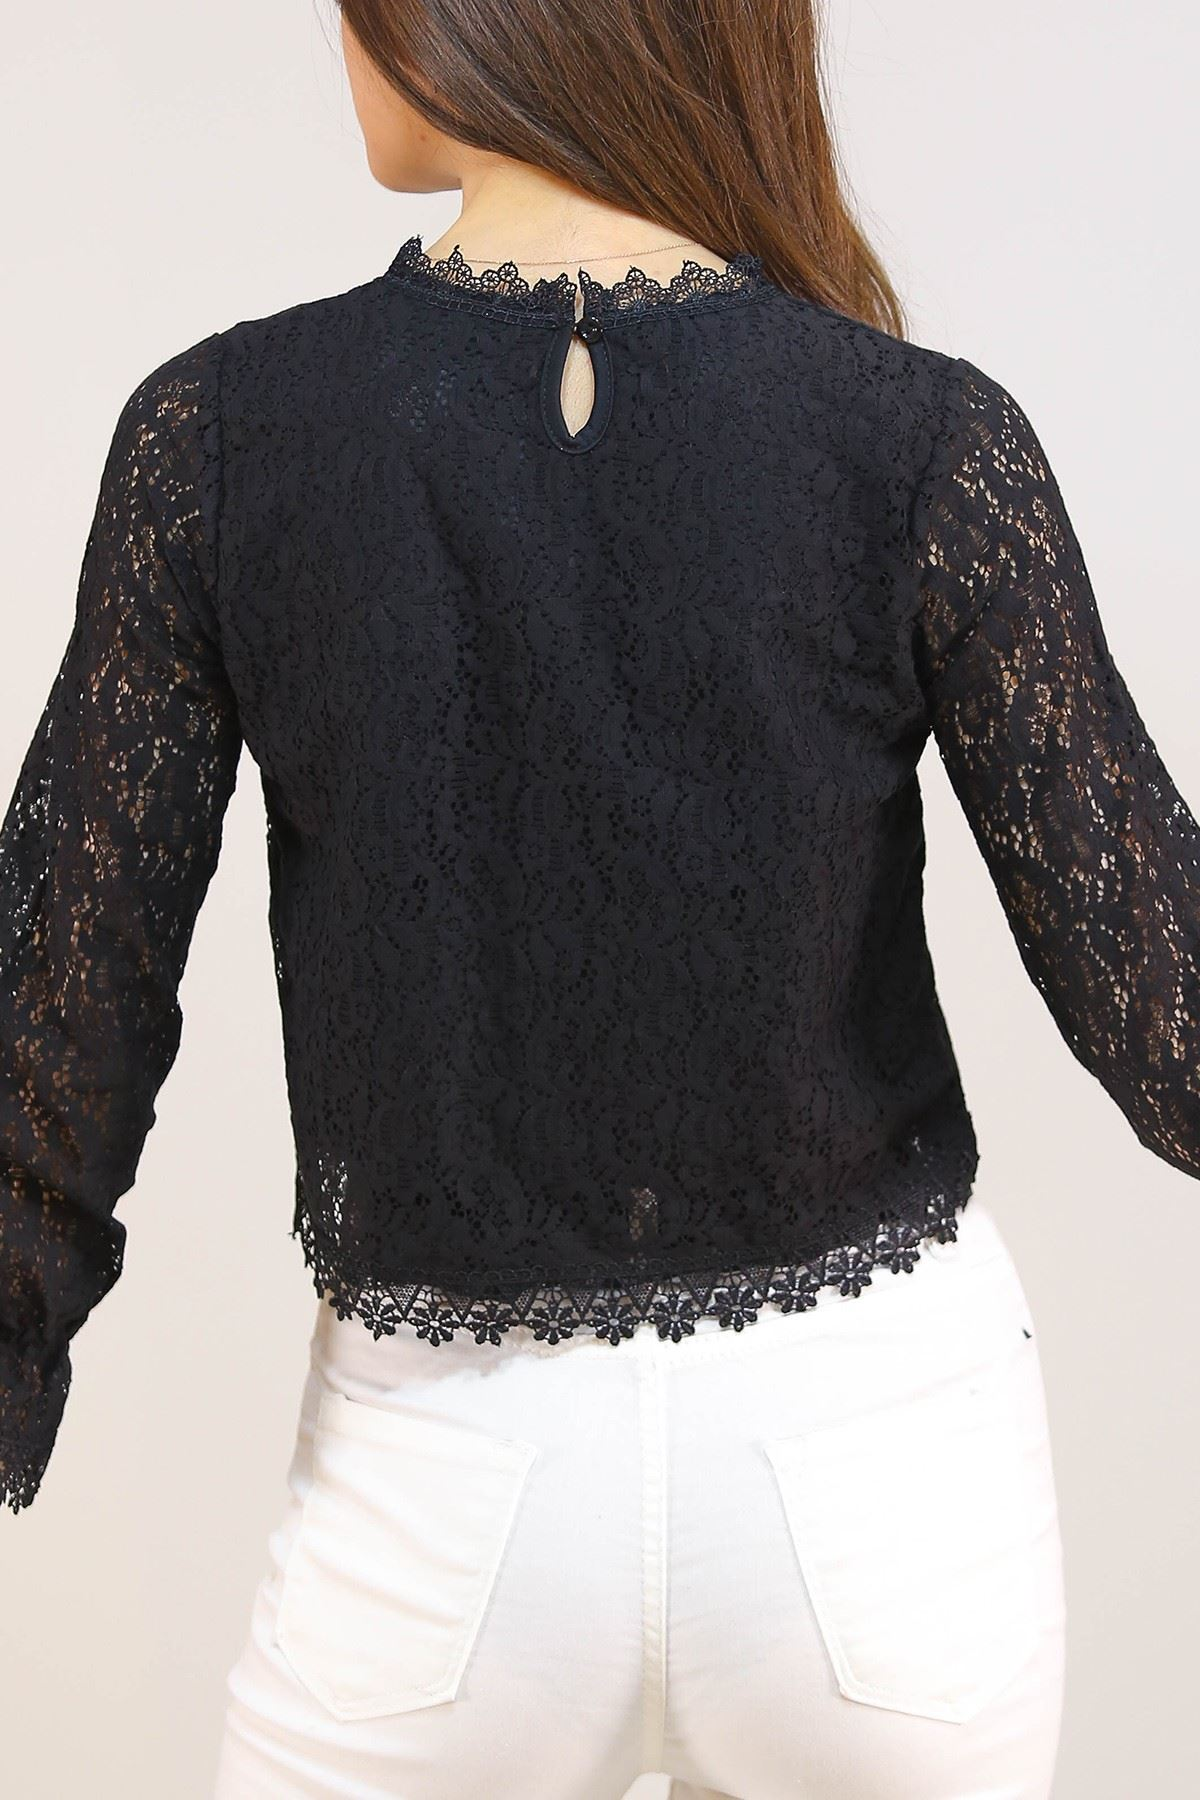 Dantelli Bluz Siyah - 5210.224.